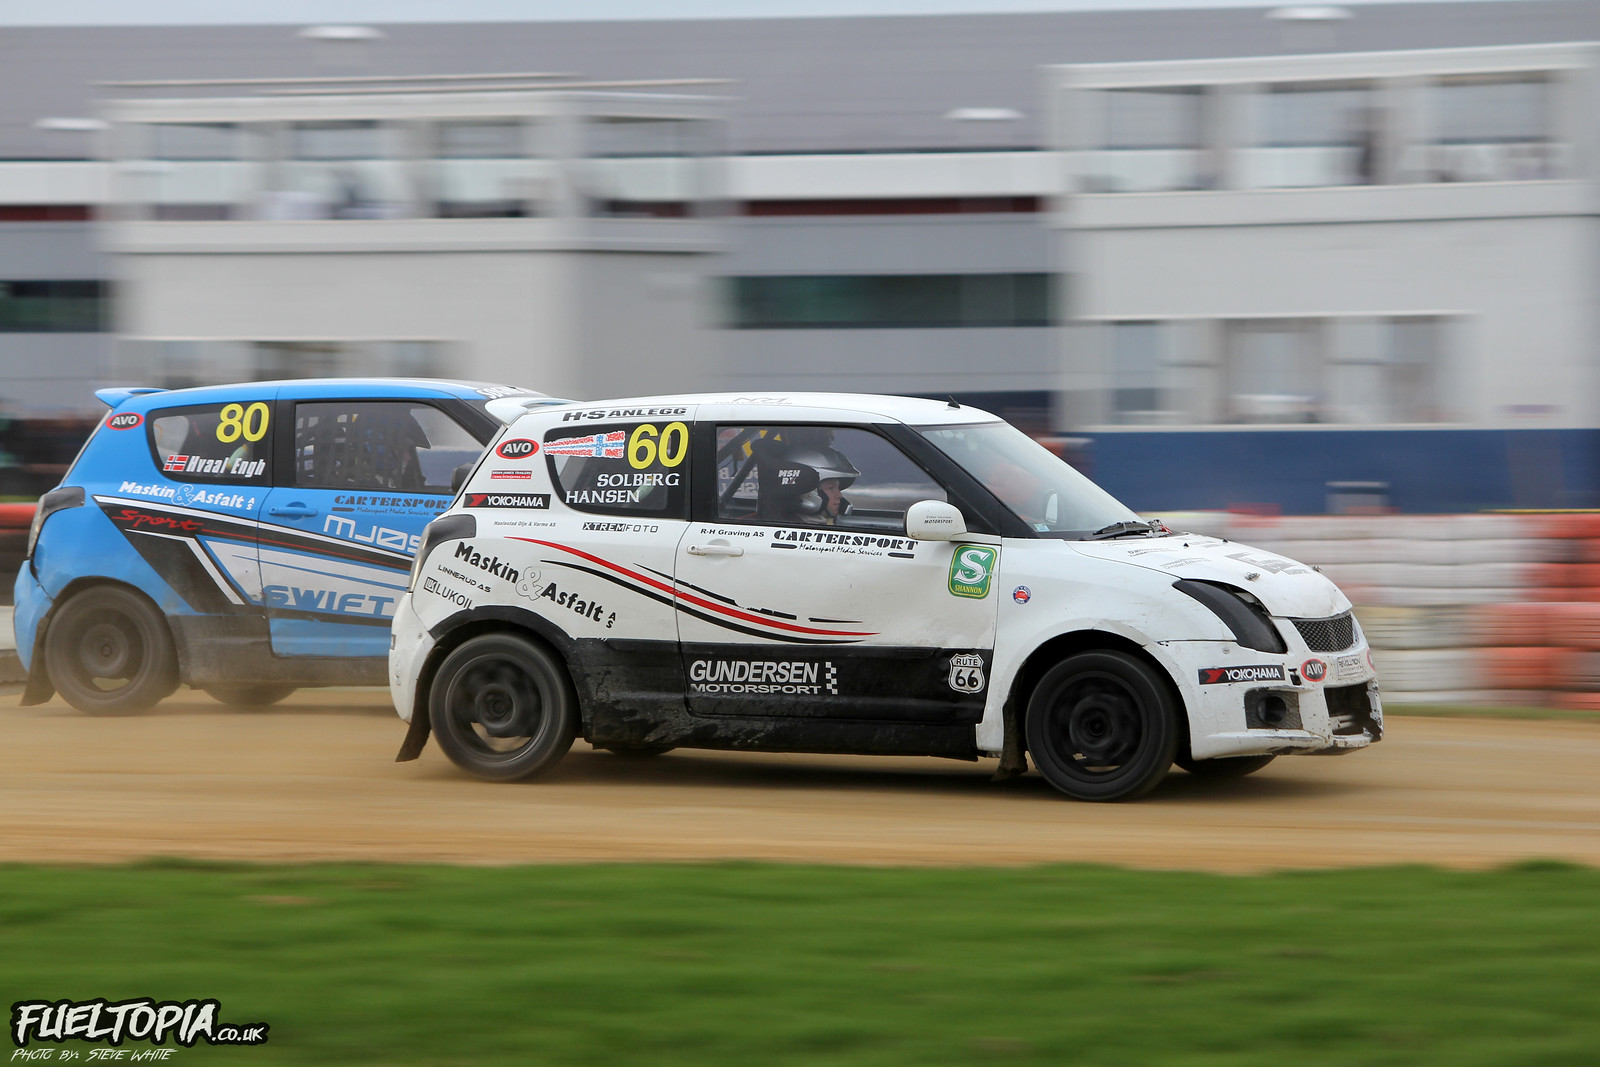 Suzuki Swift Marius Solberg-Hansen Kristiane Hvaal Engh Silverstone BRX British Rallycross Championship 2018 Steve White Fueltopia